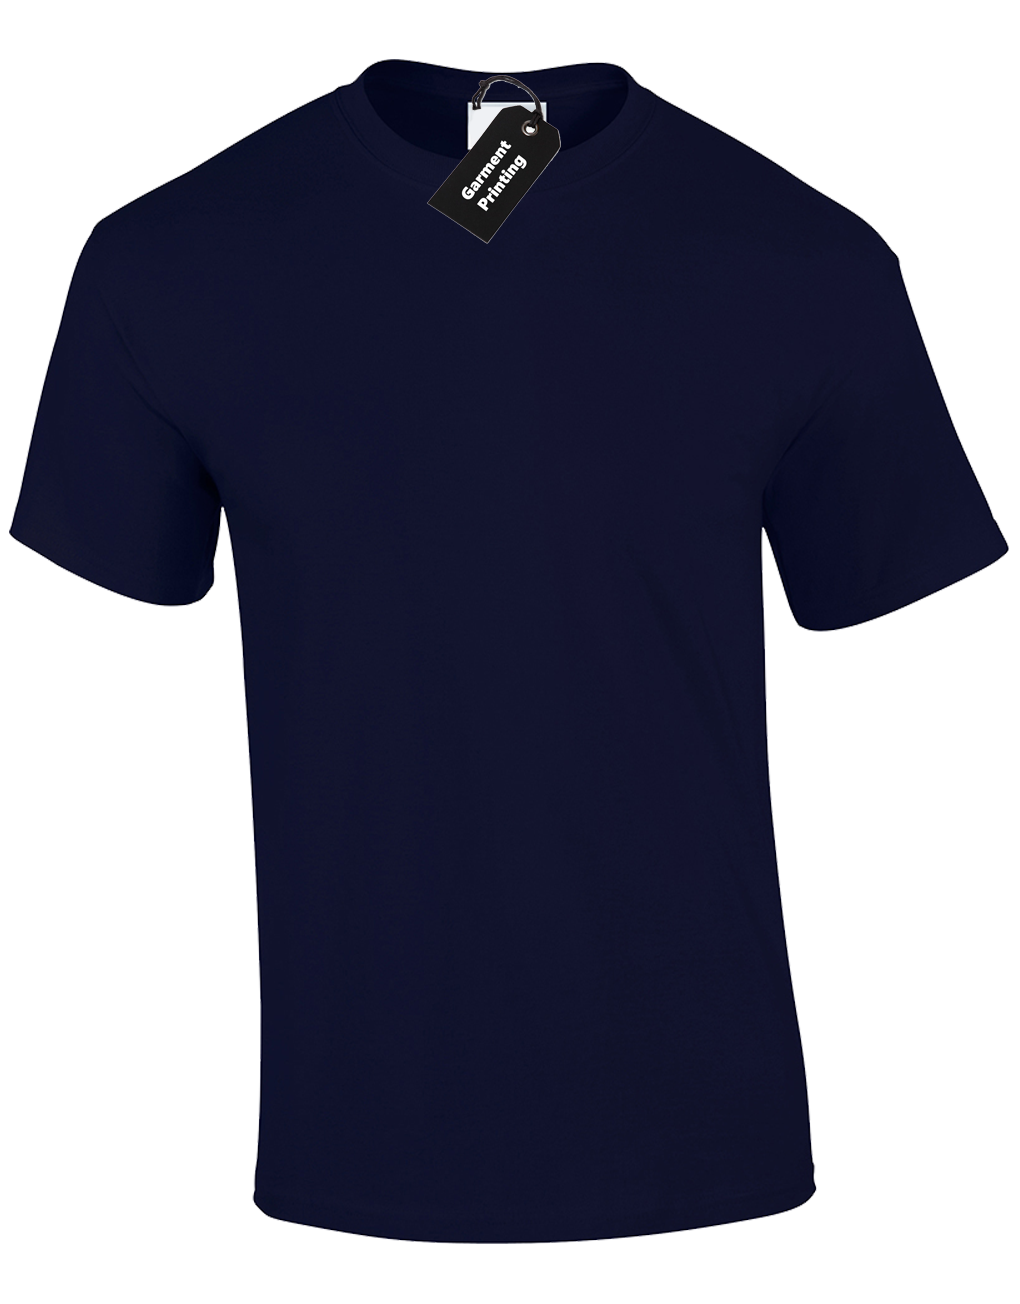 Mens Personalised Printed T-Shirt Unisex Custom Design Logo Uniform Stag Do Fun 4